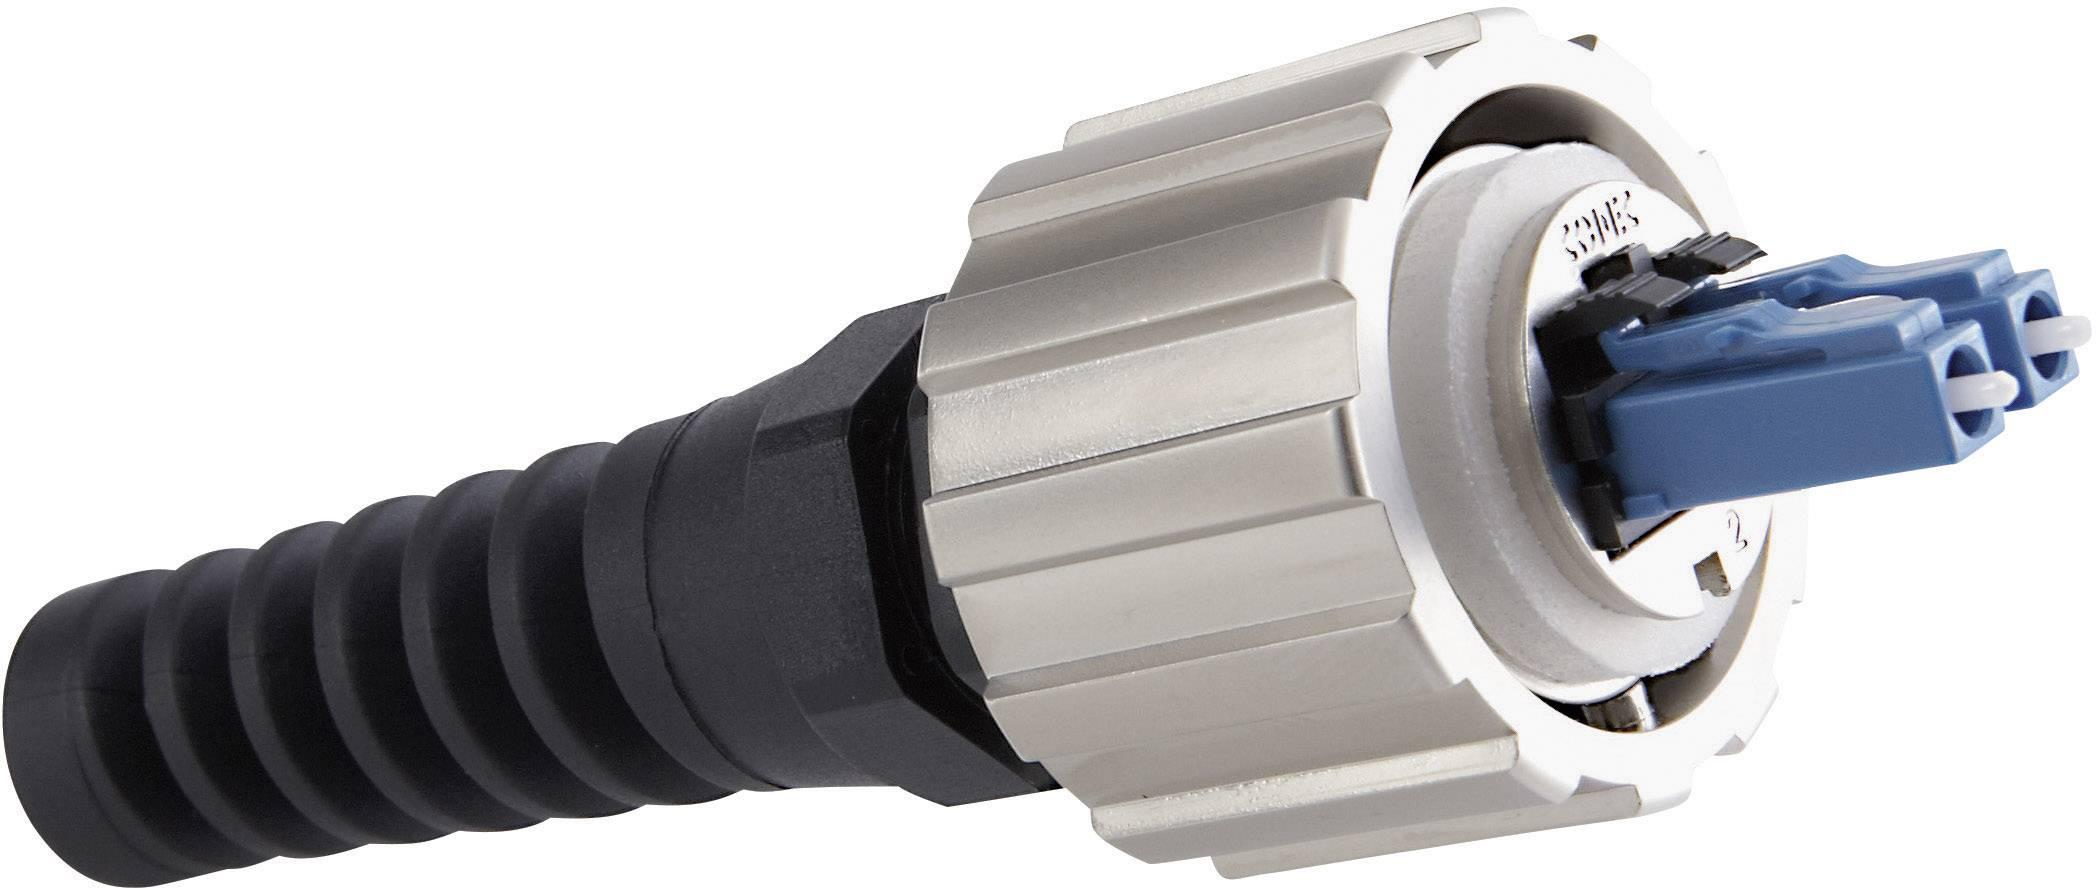 Konektor optických vláken IP67 Conec, 17-300090